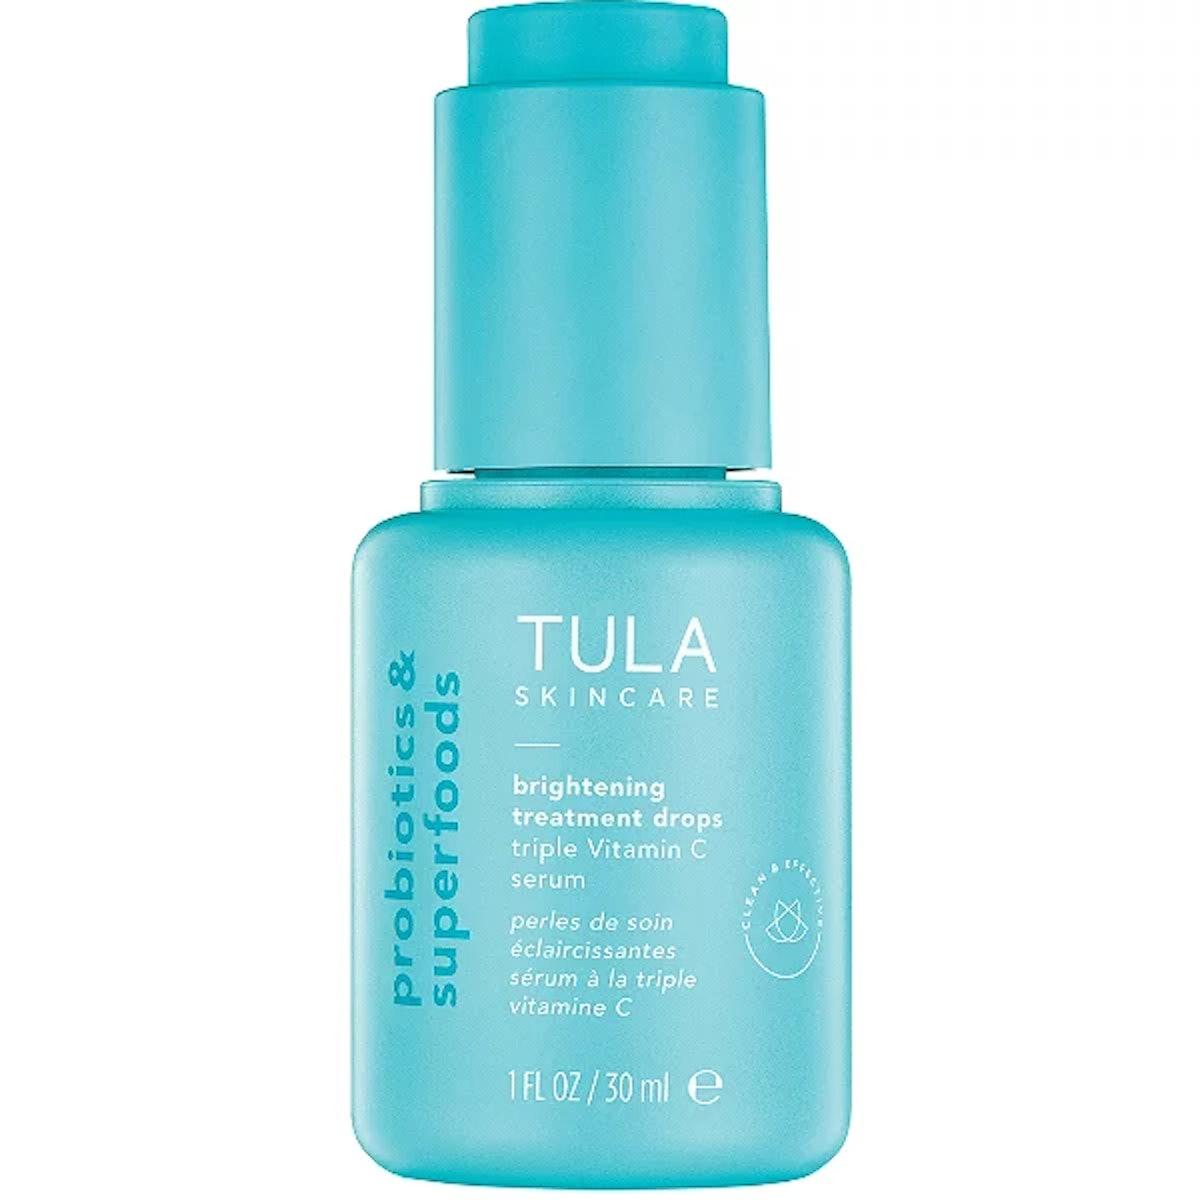 Tula Brightening Treatment Drops Triple Vitamin C Serum